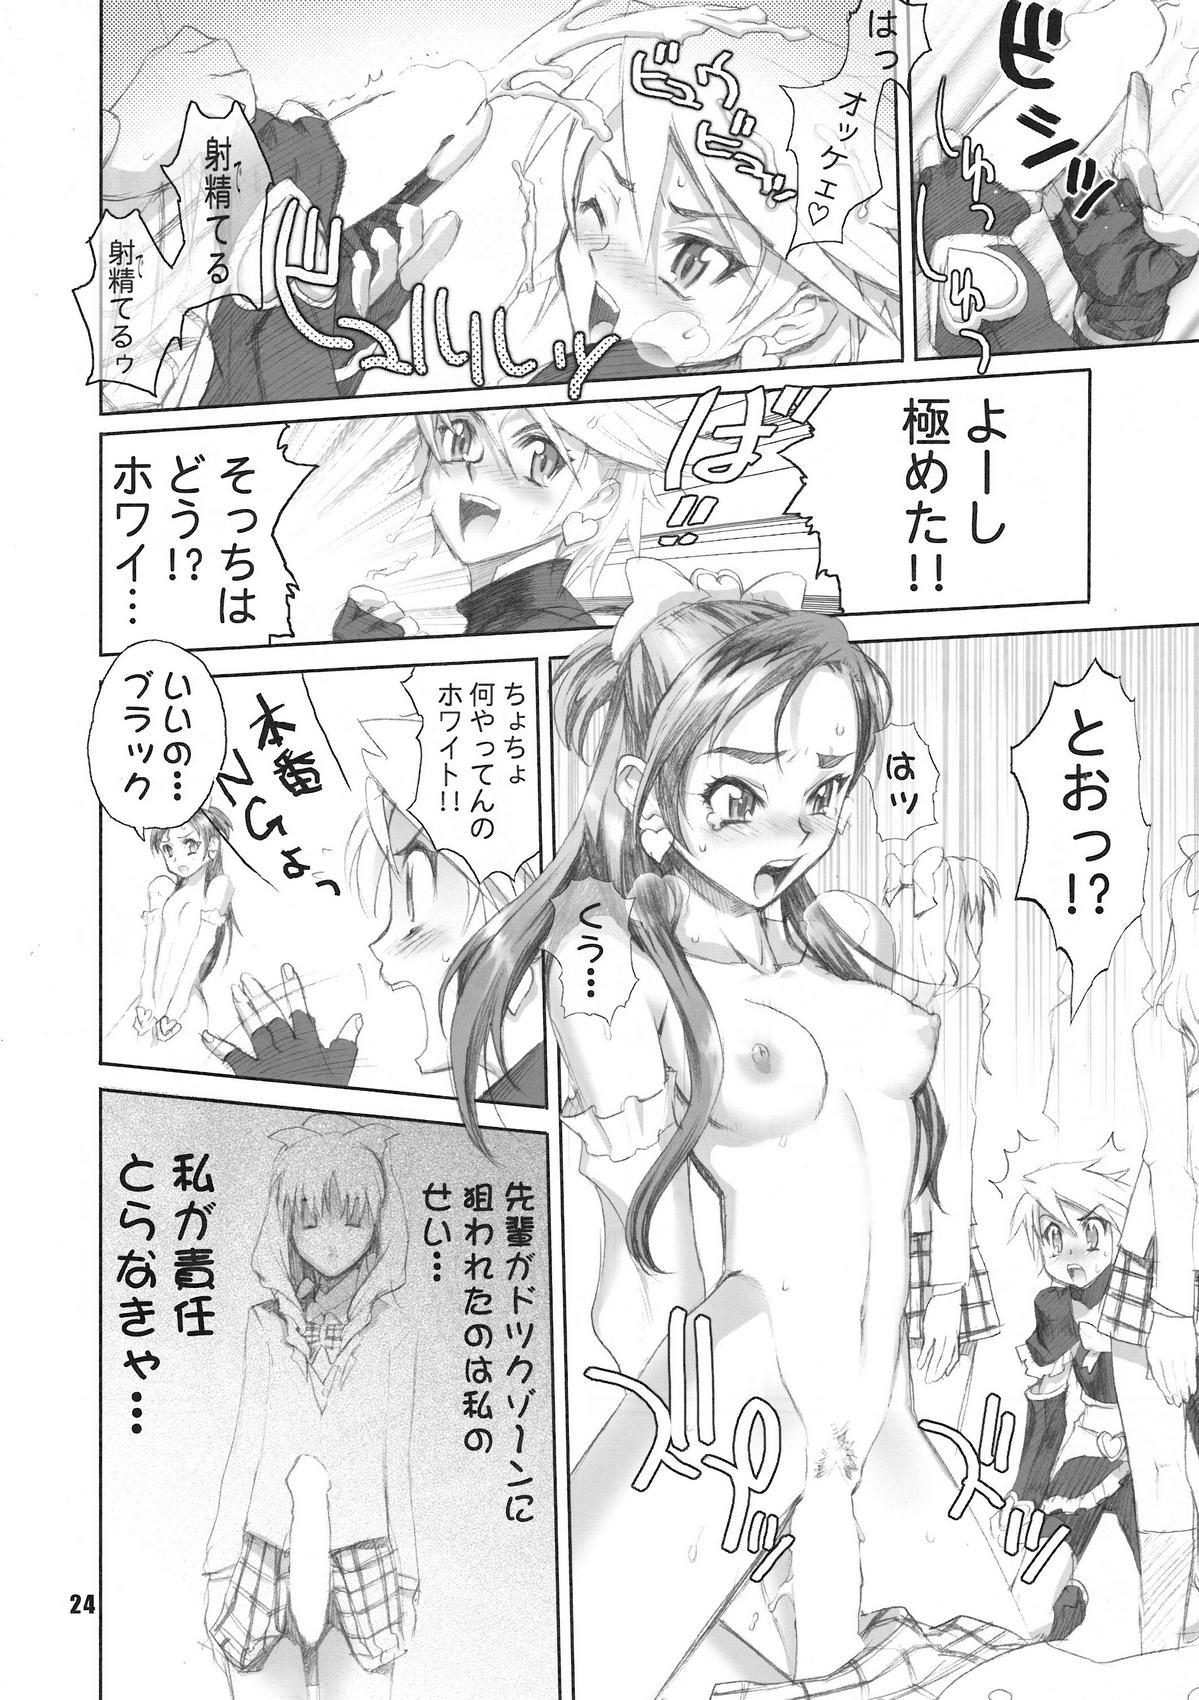 Inazuma Pretty Warrior 22